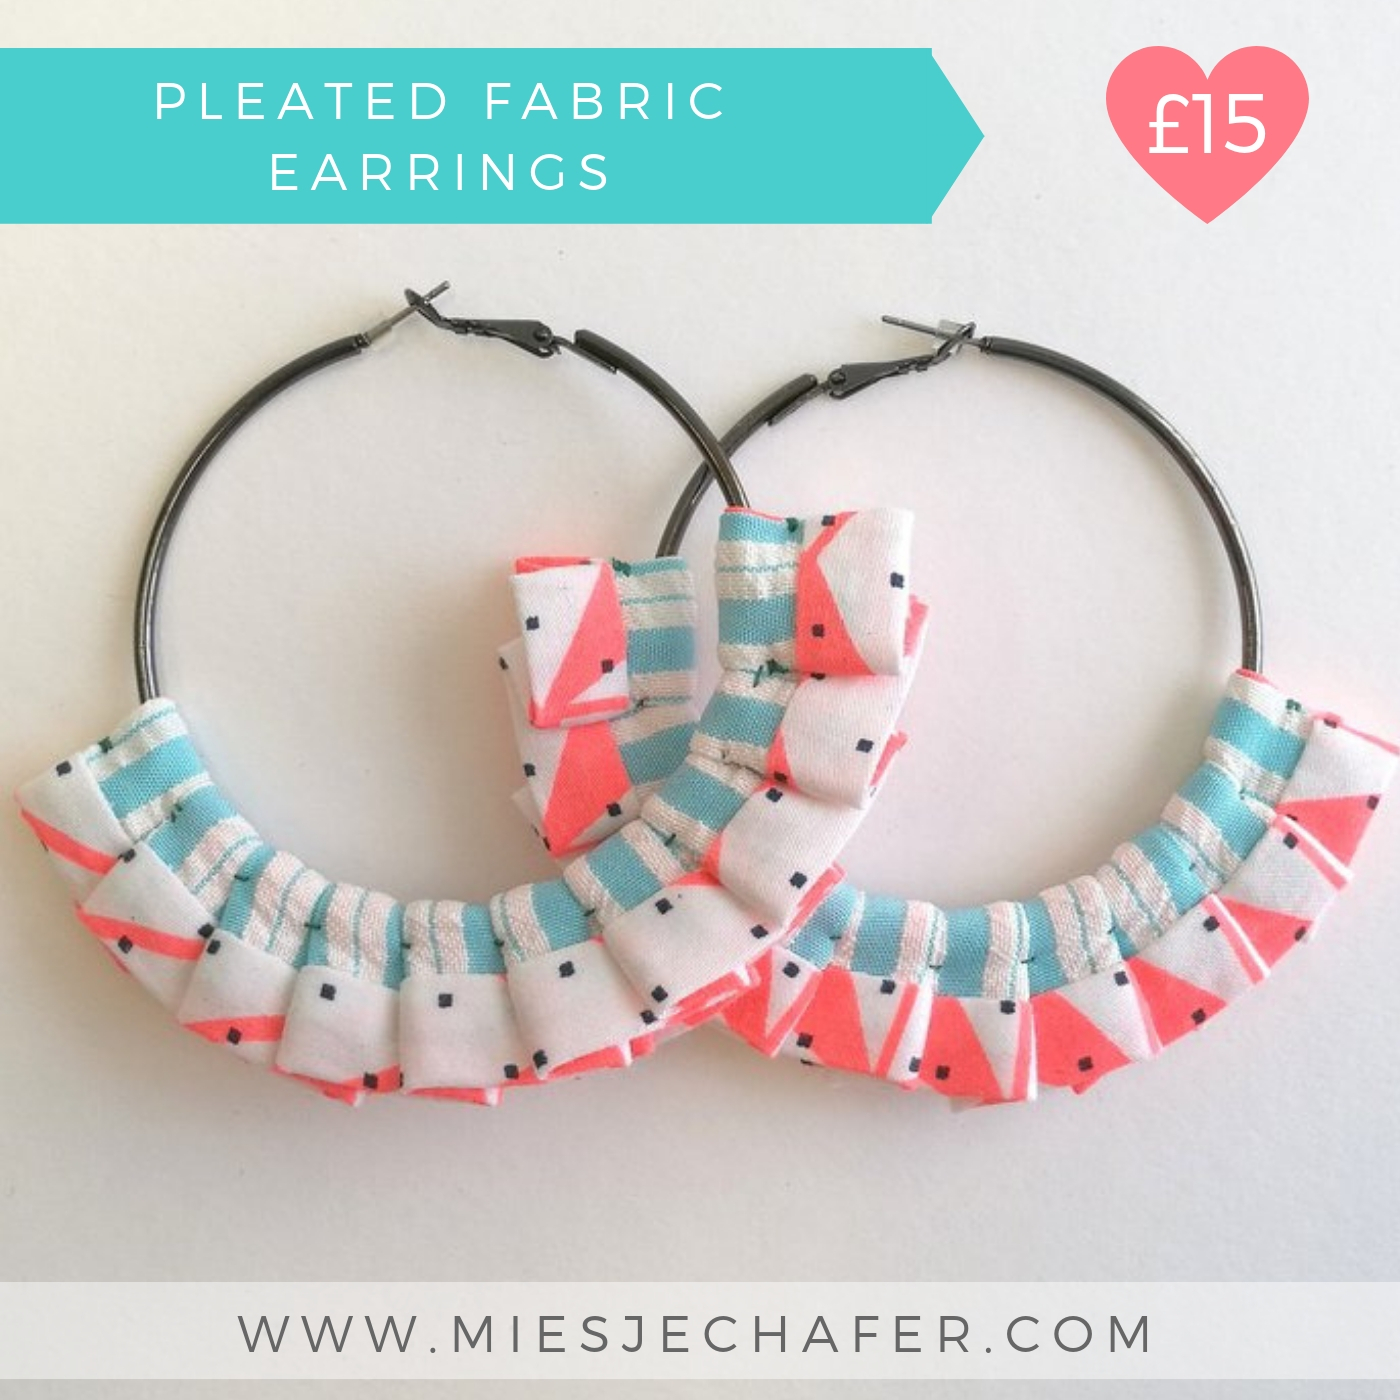 Fabric Pleated Earrings | Screen Printed Fabirc | Gift Guide | Miesje Chafer